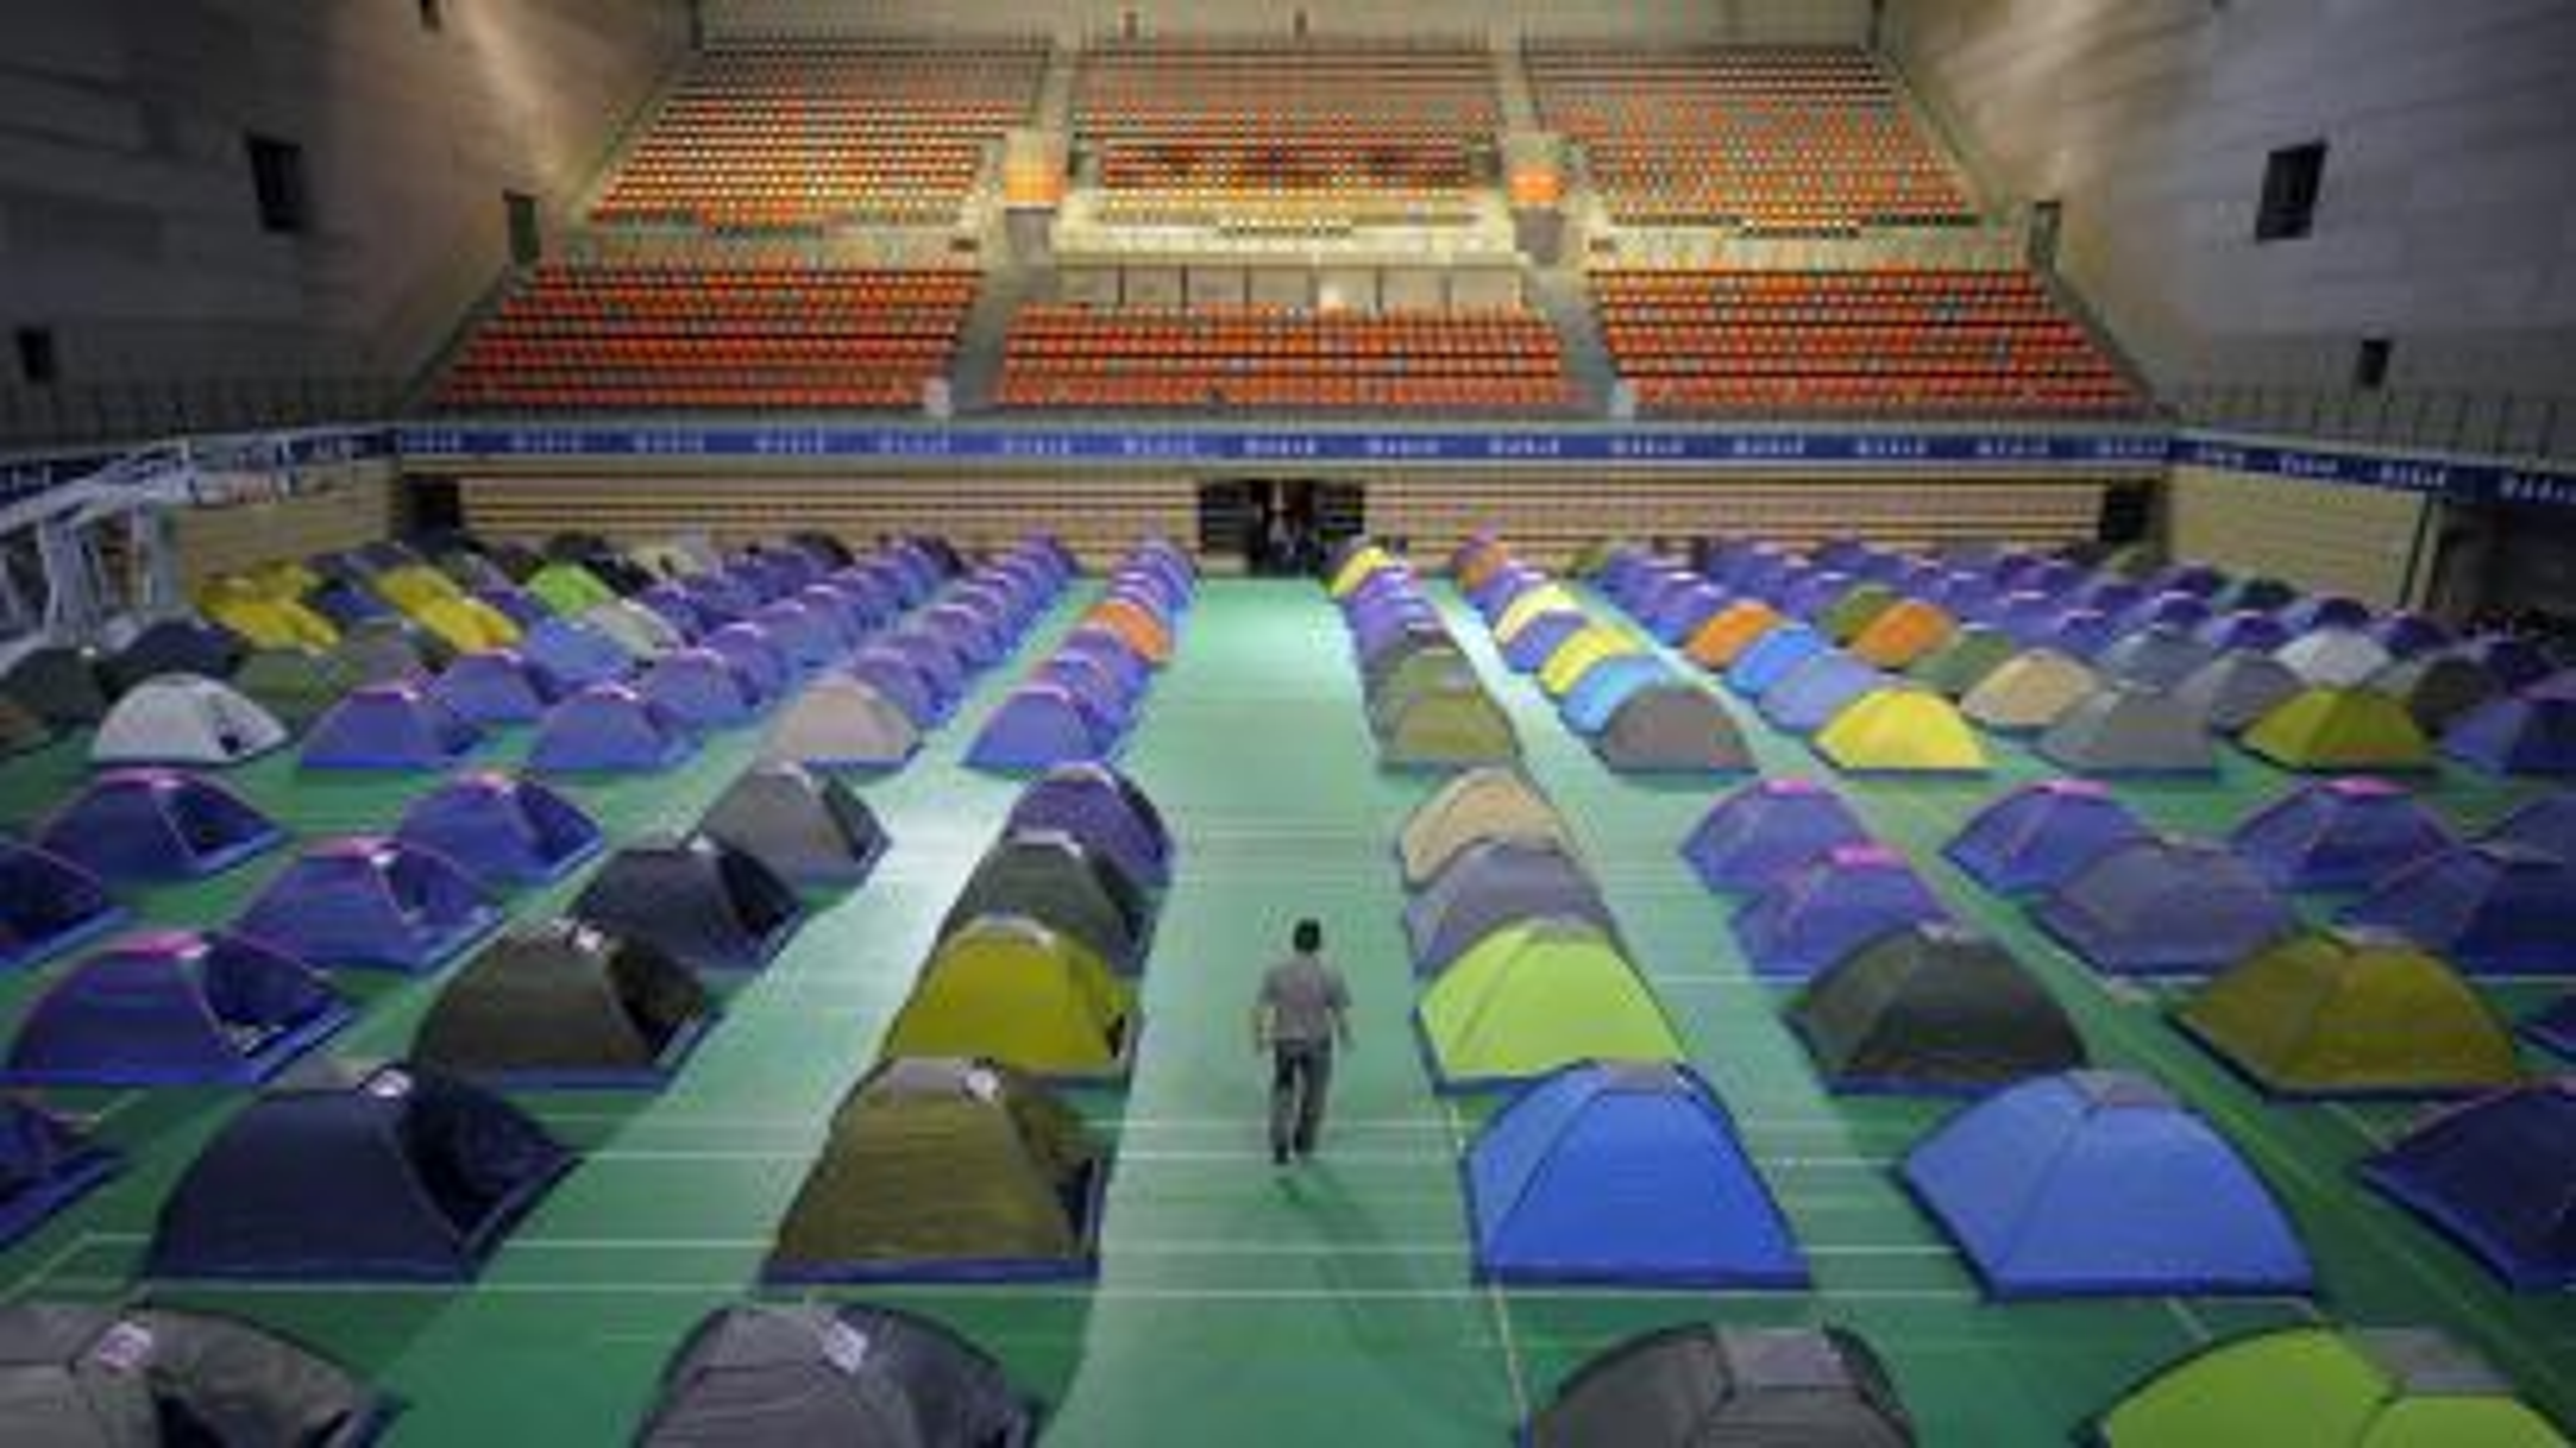 Tianjin University set up tents for parents